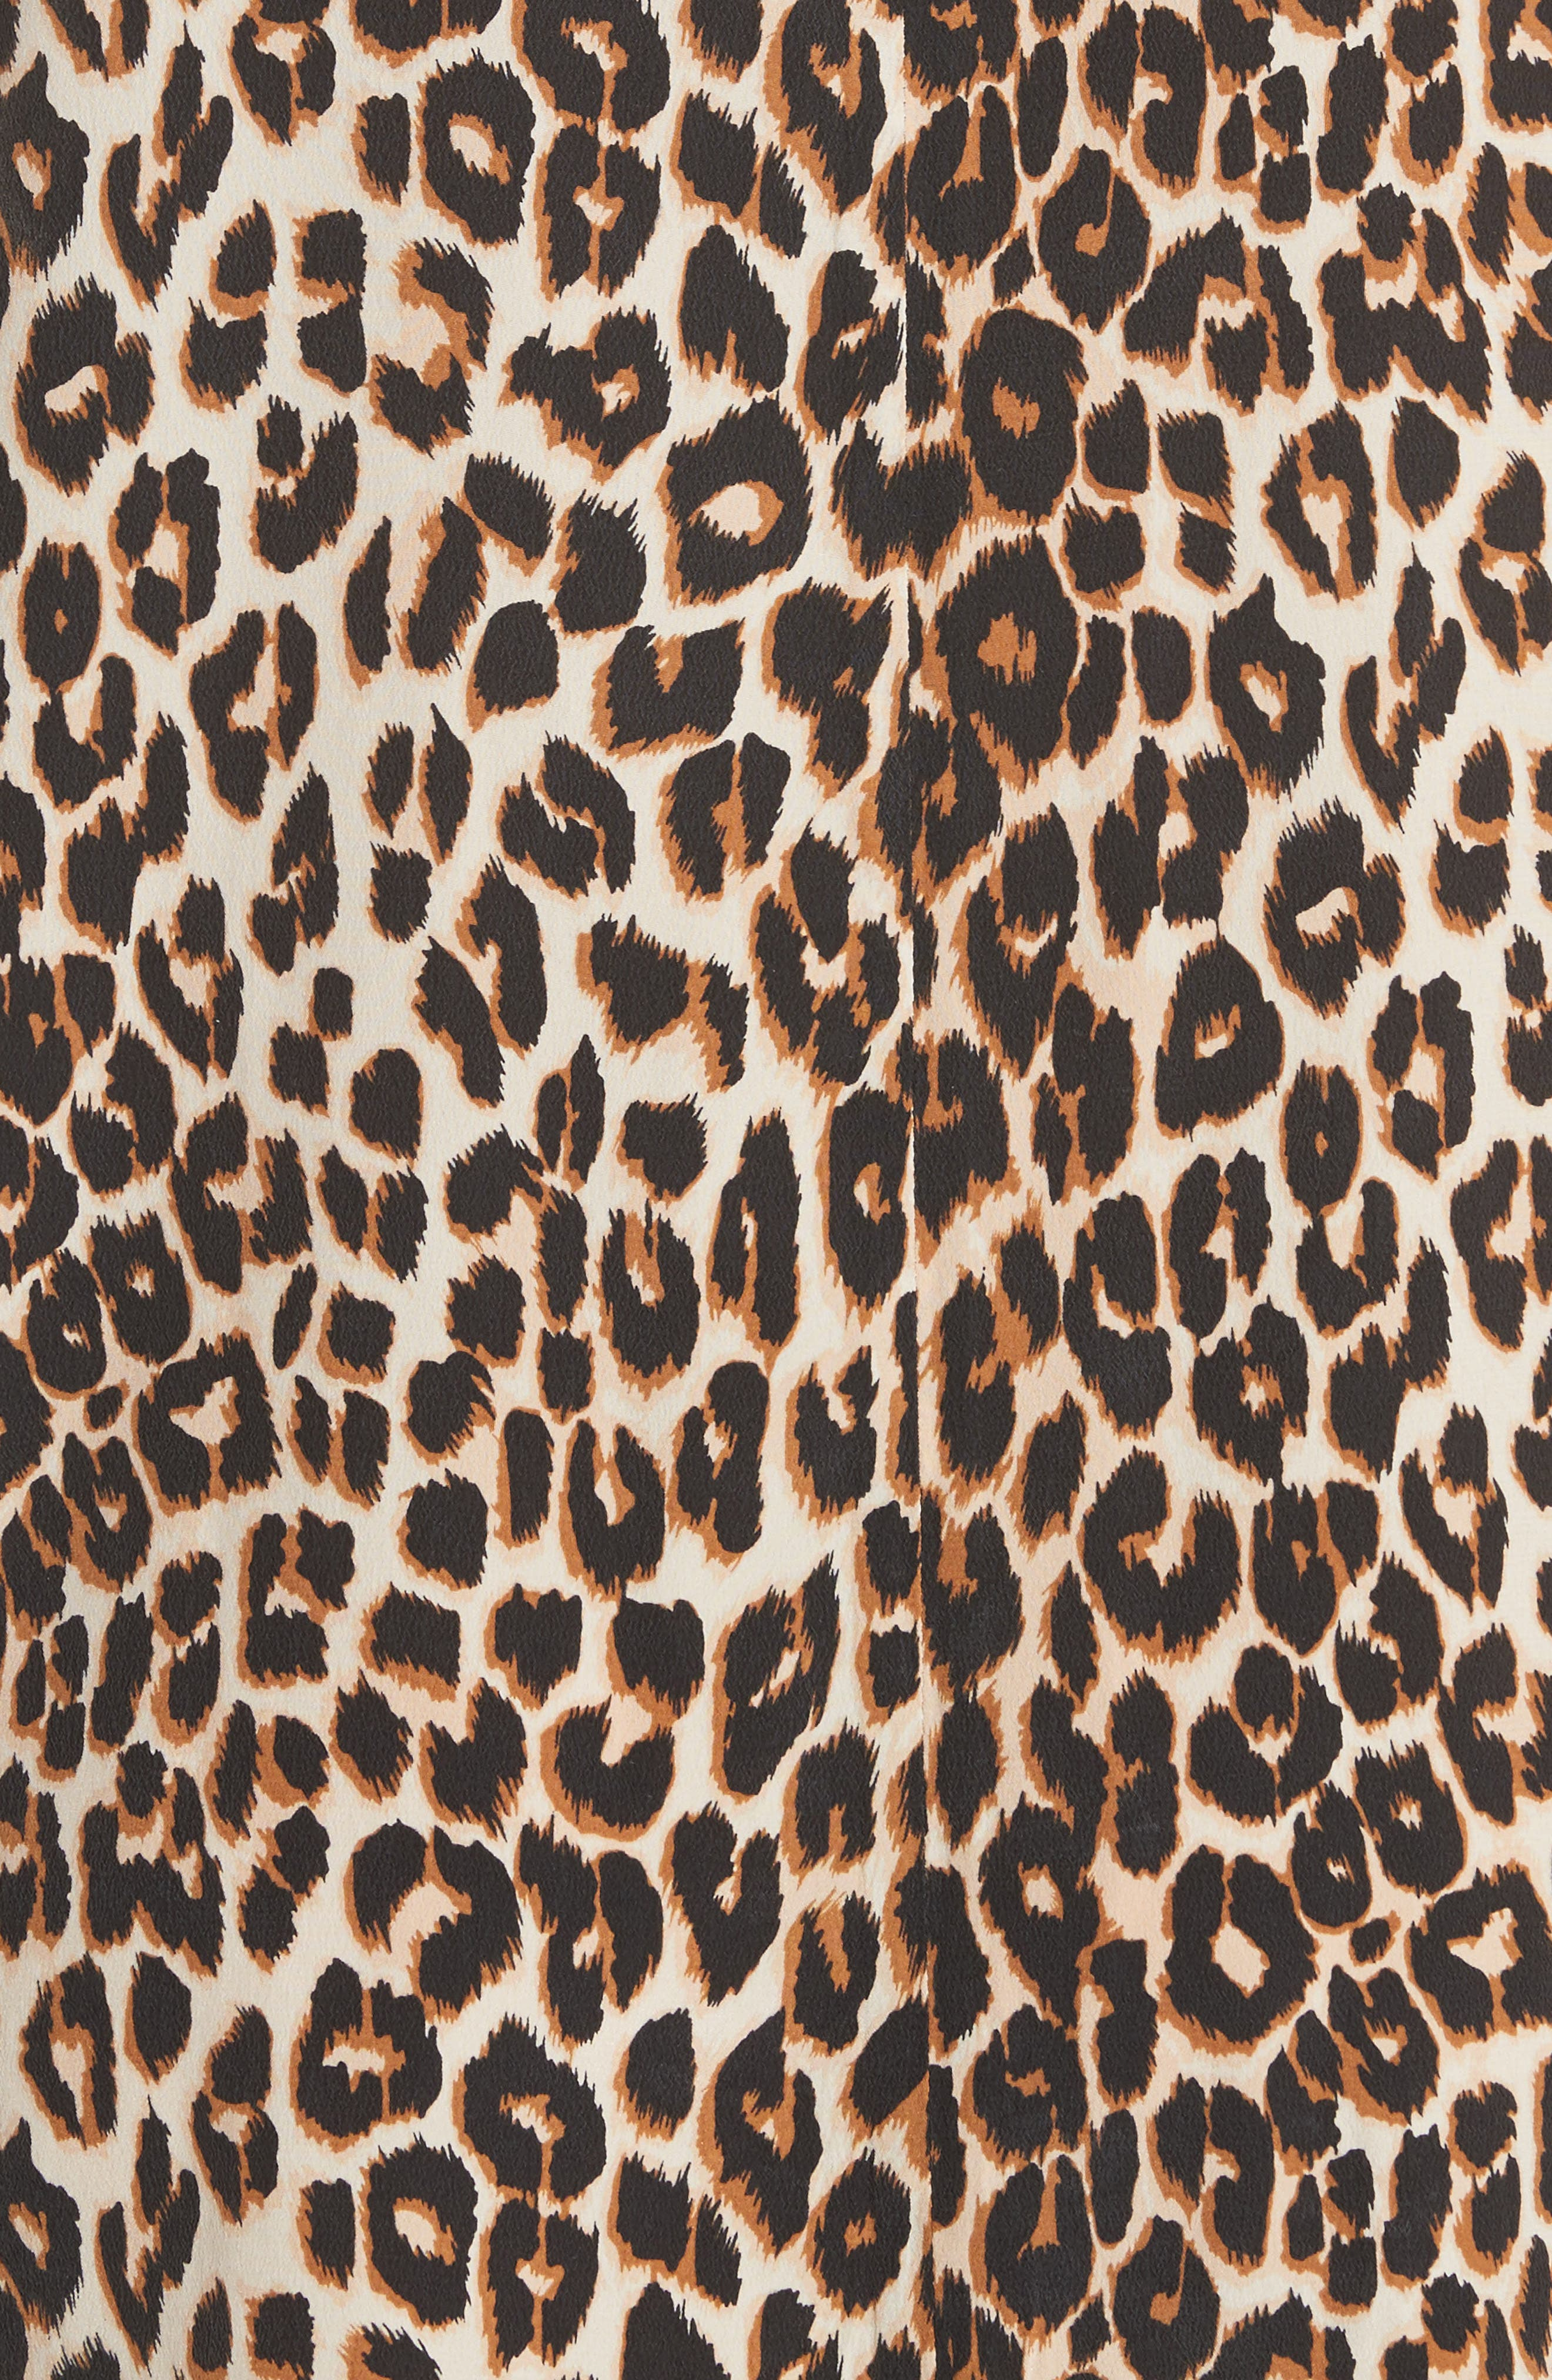 Leopard Print Silk Shift Dress,                             Alternate thumbnail 5, color,                             101